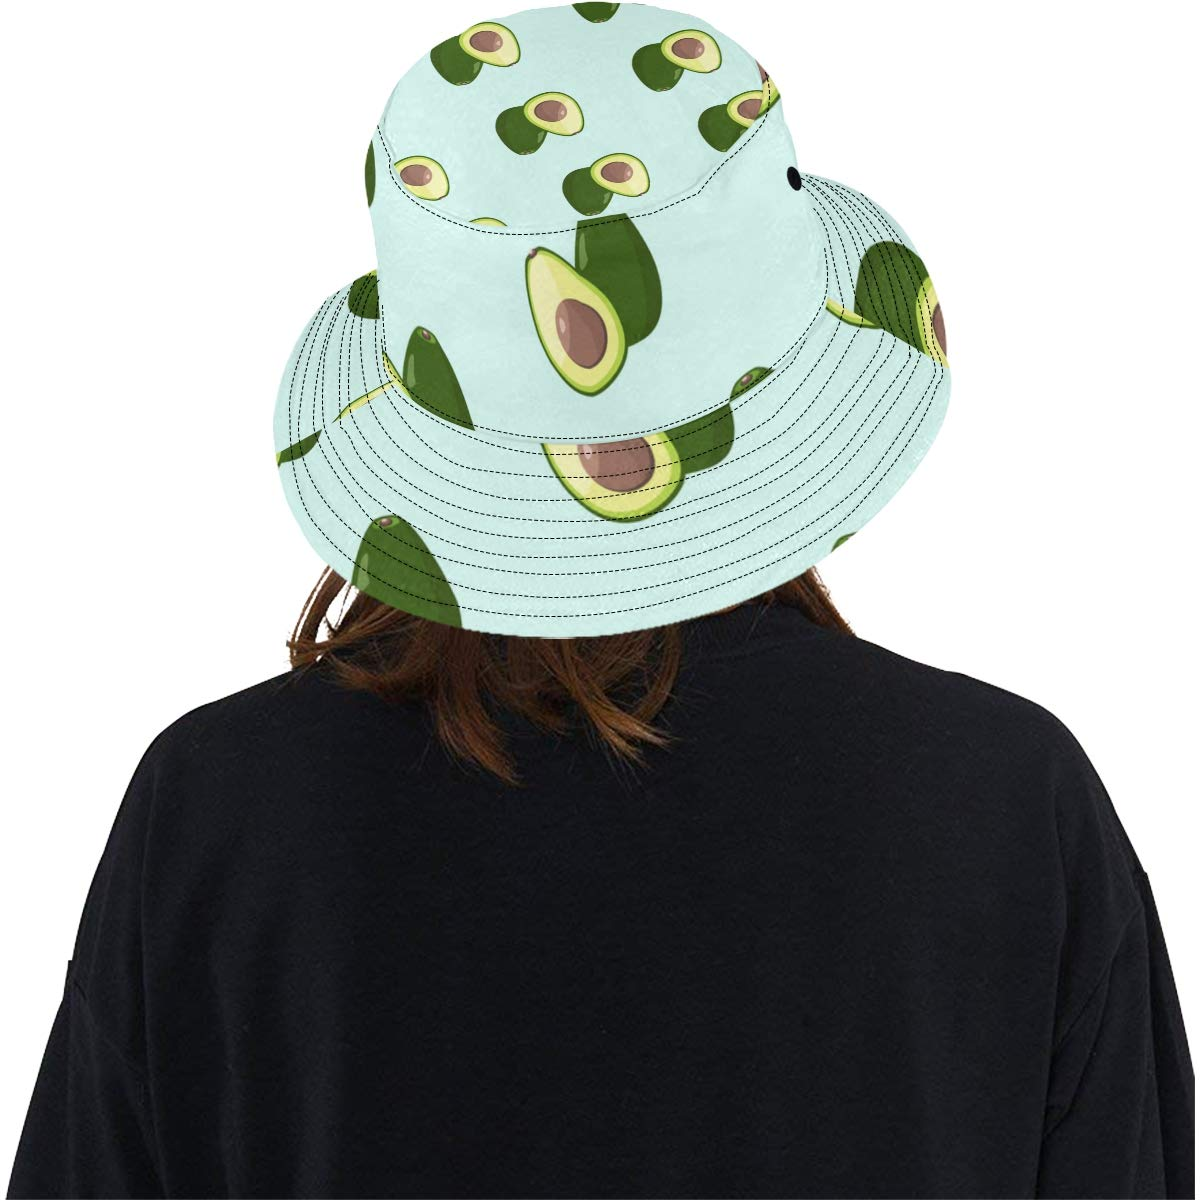 Interesting Avocado Fresh Summer Unisex Fishing Sun Top Bucket Hats for Kid Teens Women and Men with Packable Fisherman Cap for Outdoor Baseball Sport Picnic